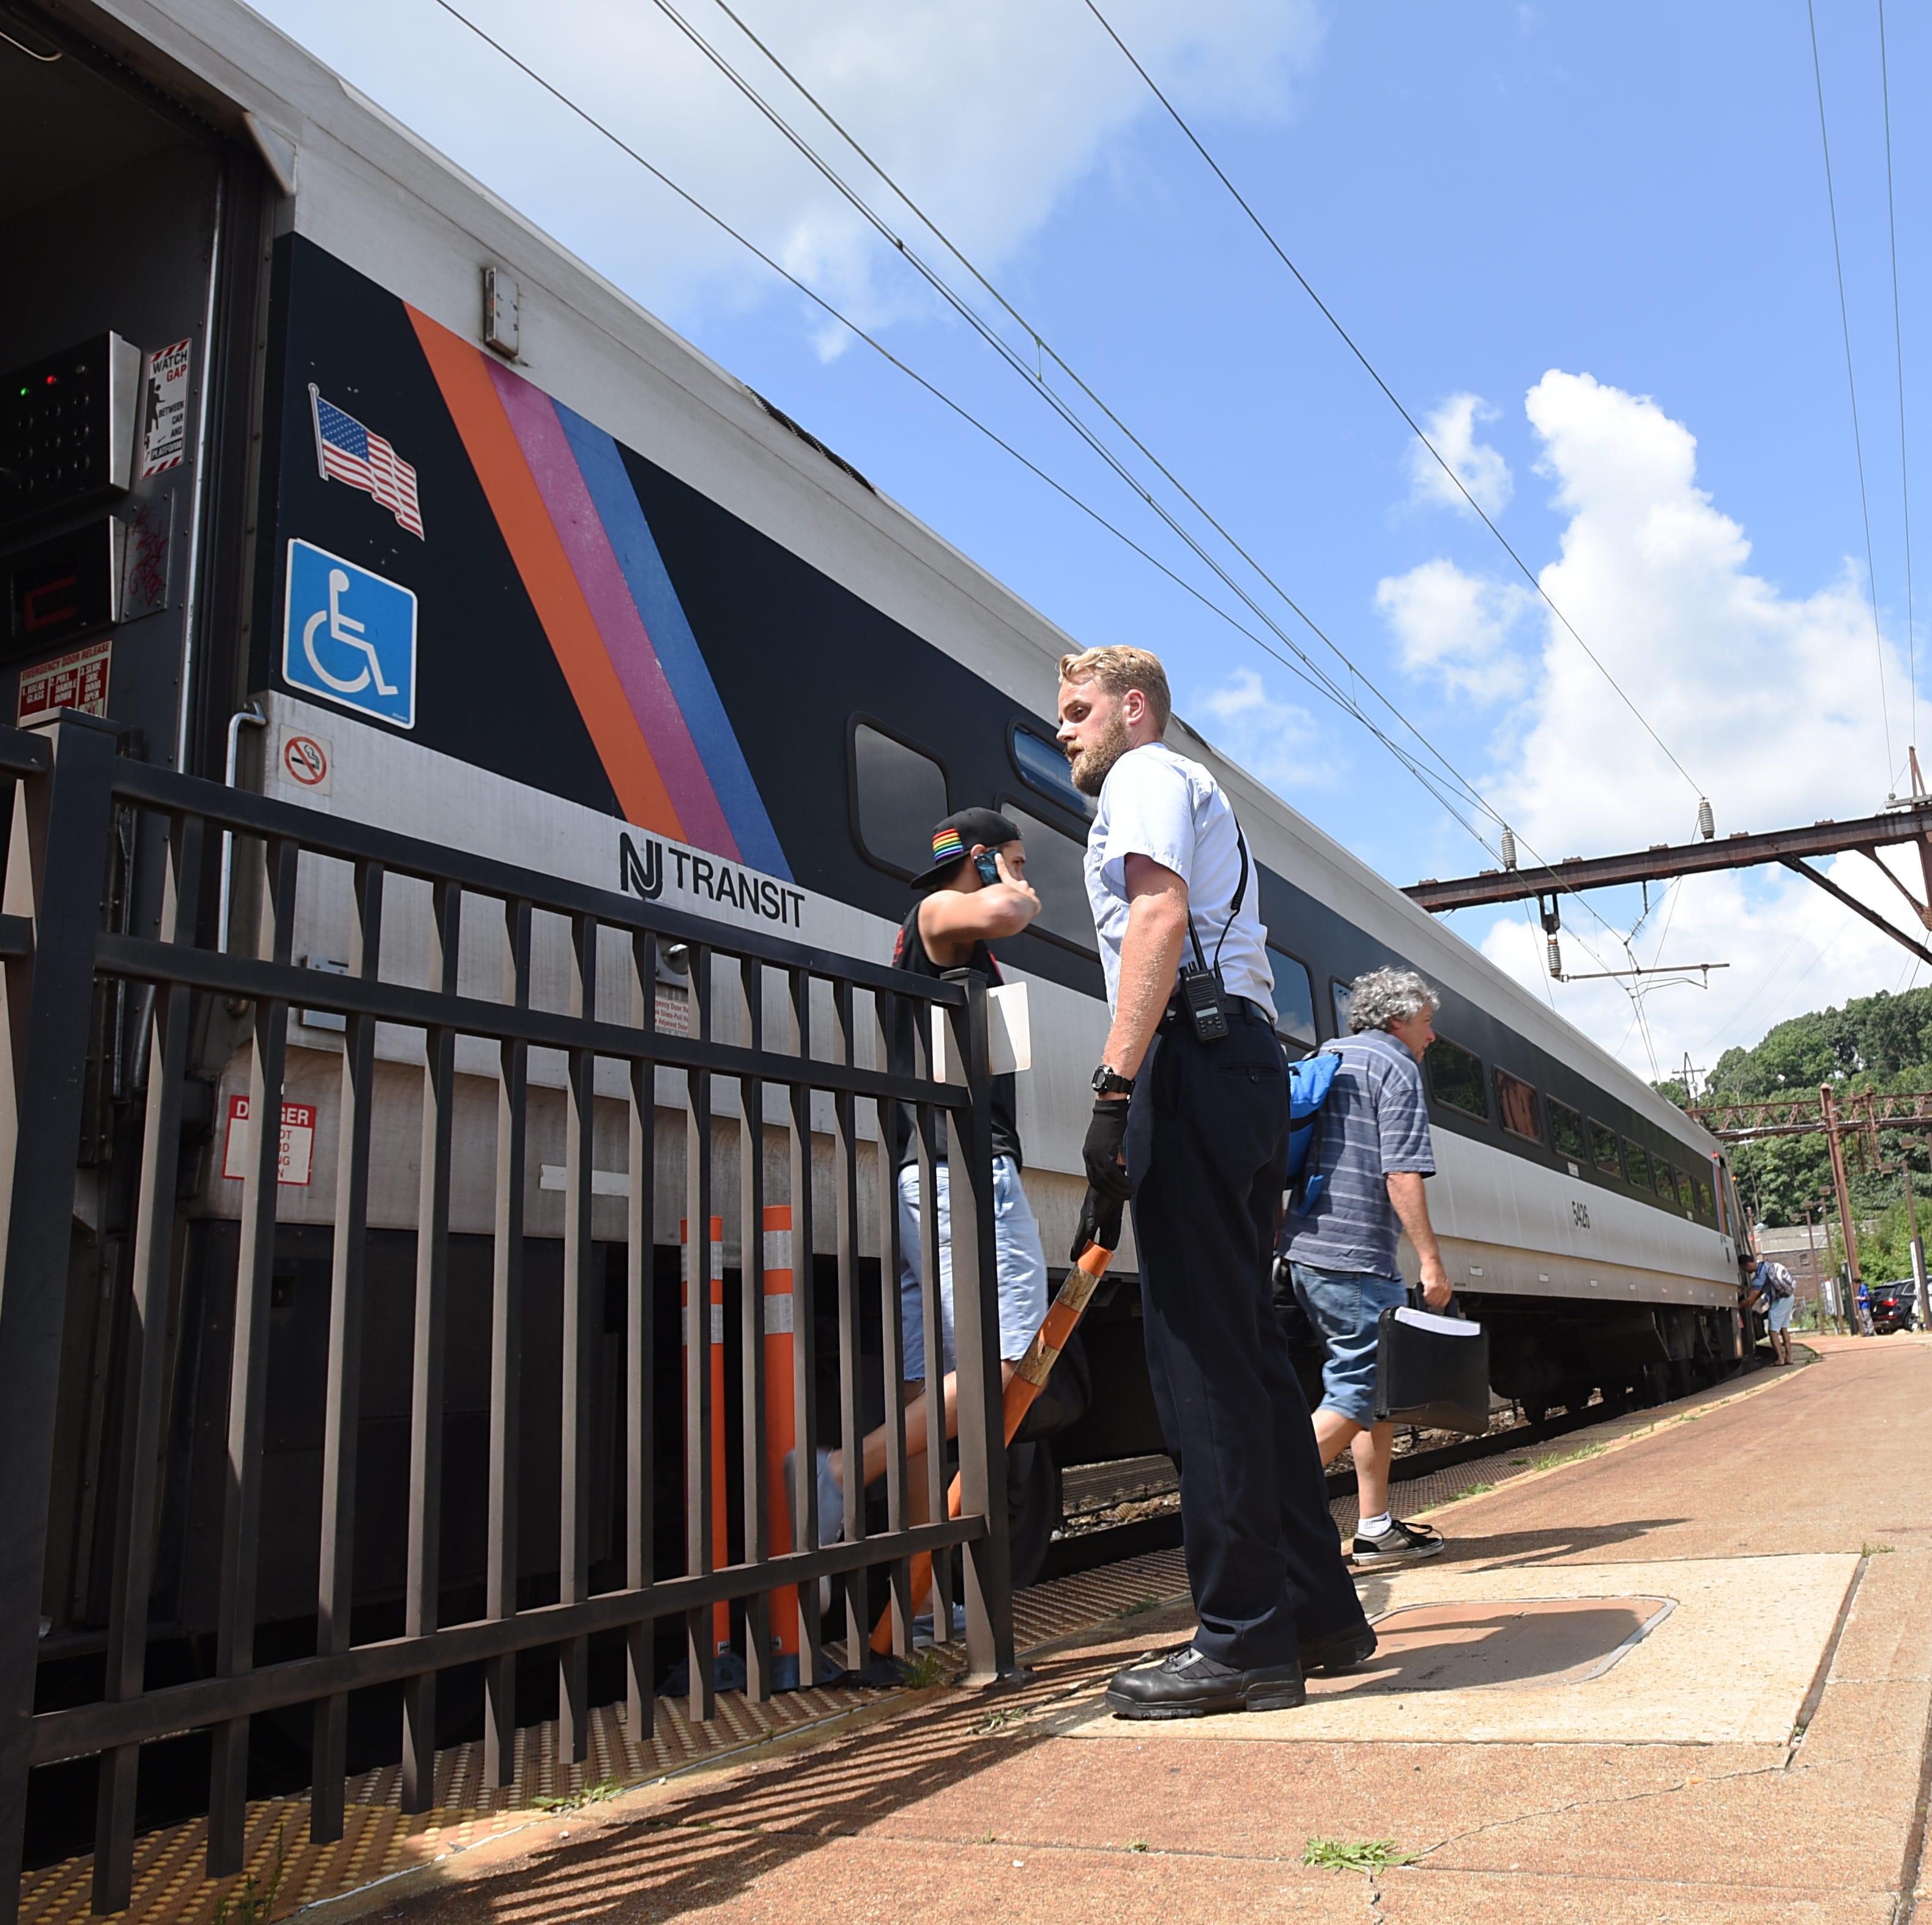 NJ Transit: 'Manpower shortage' causes cancellations on Morris & Essex line